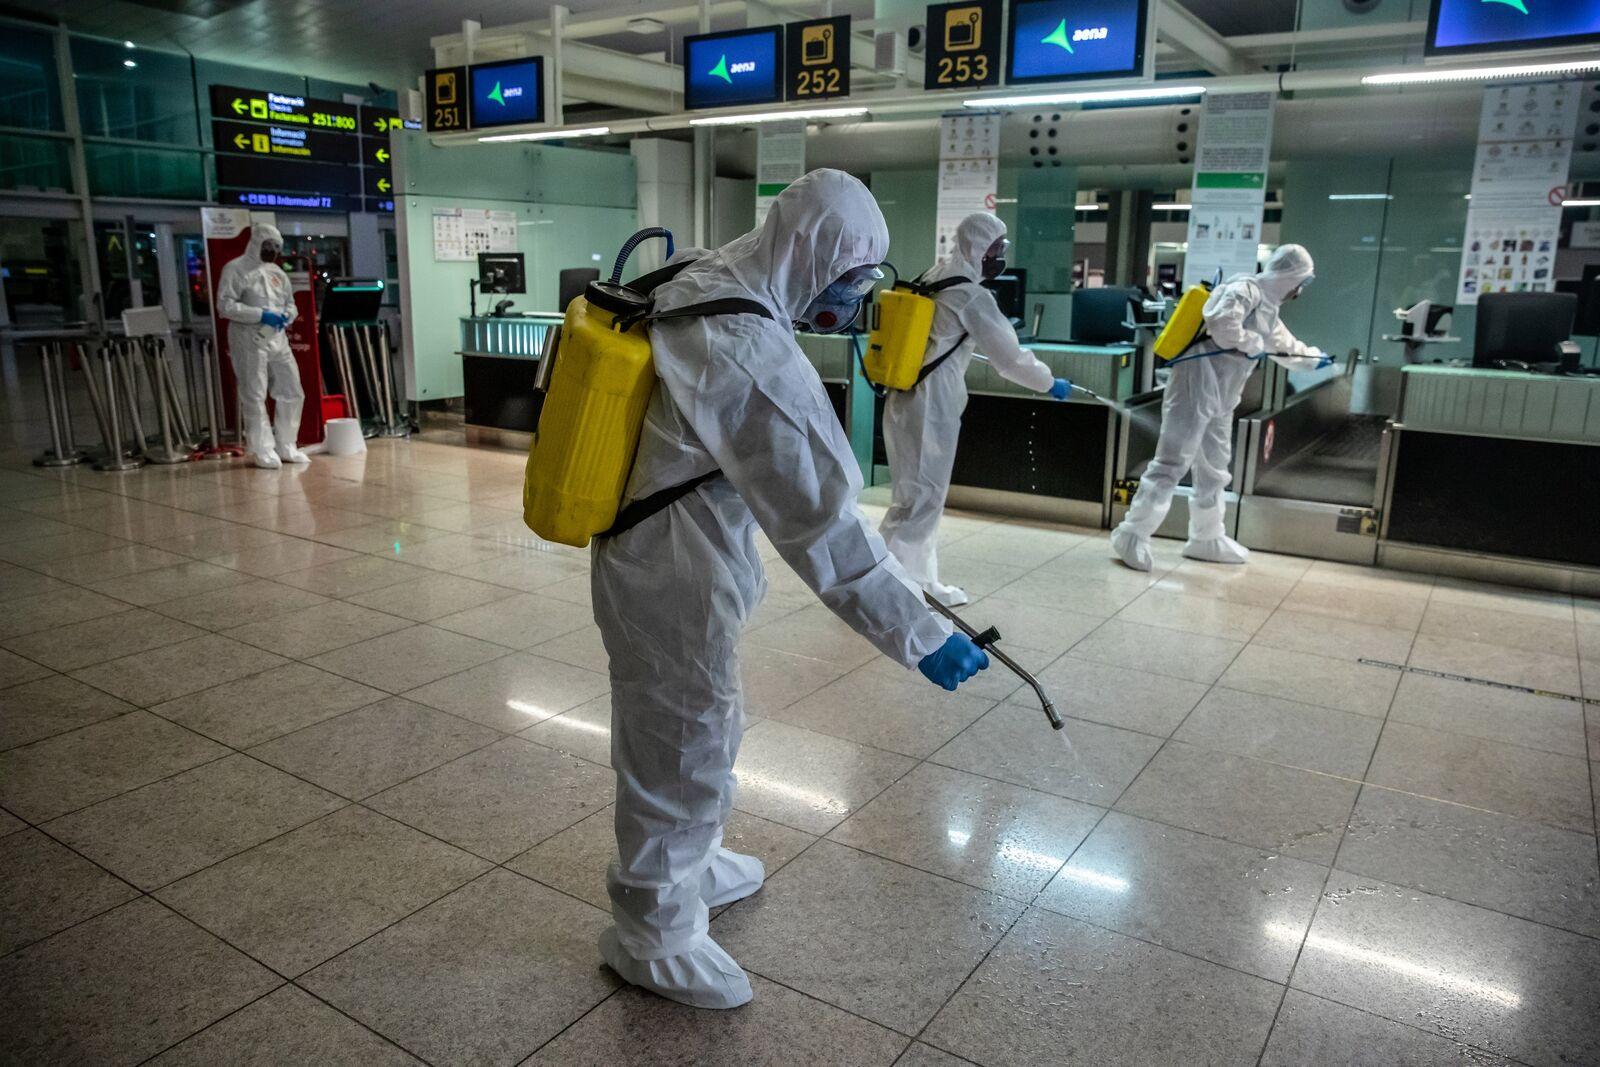 Military Emergencies Unit (UME) Disinfect El Prat Airport